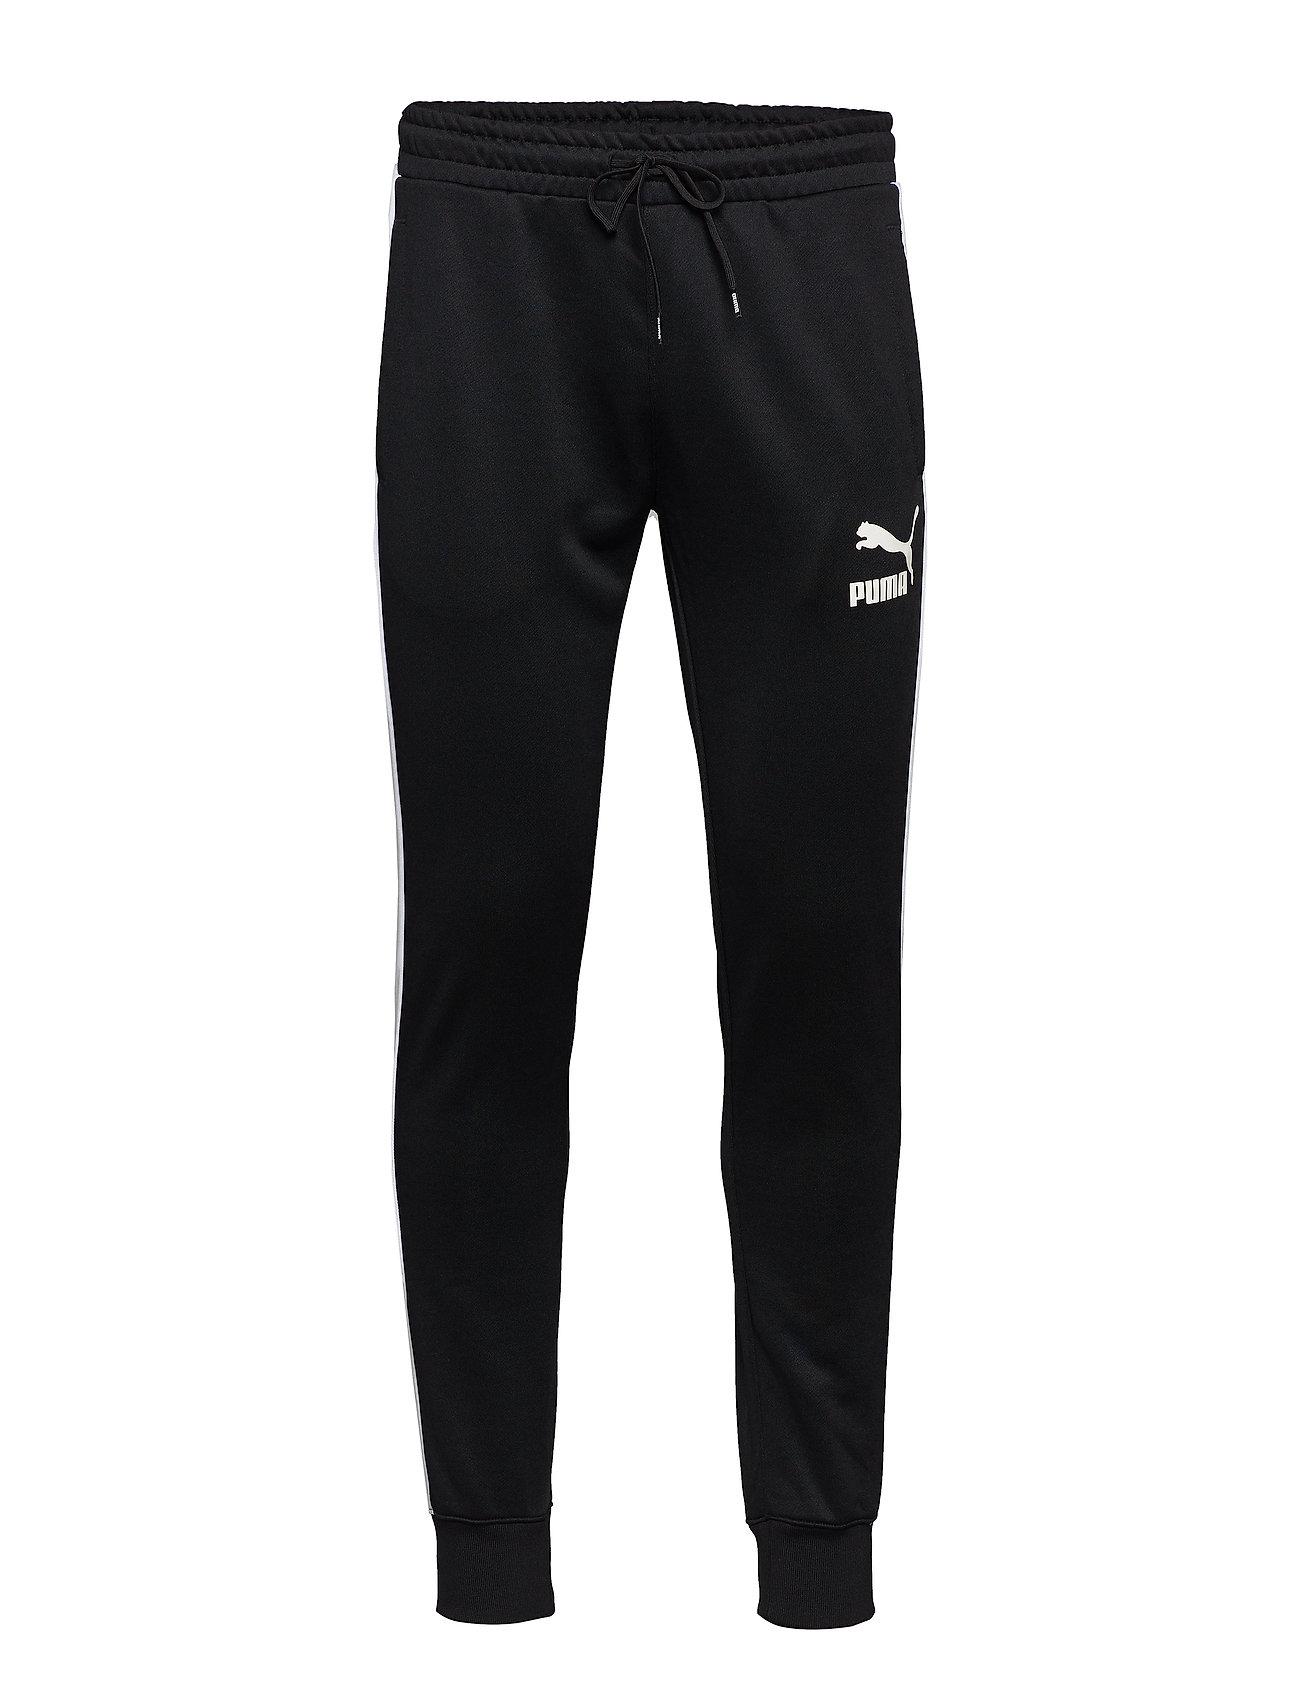 30da1ce1 PUMA BLACK PUMA Iconic T7 Track Pants Pt bukser for herre - Pashion.dk